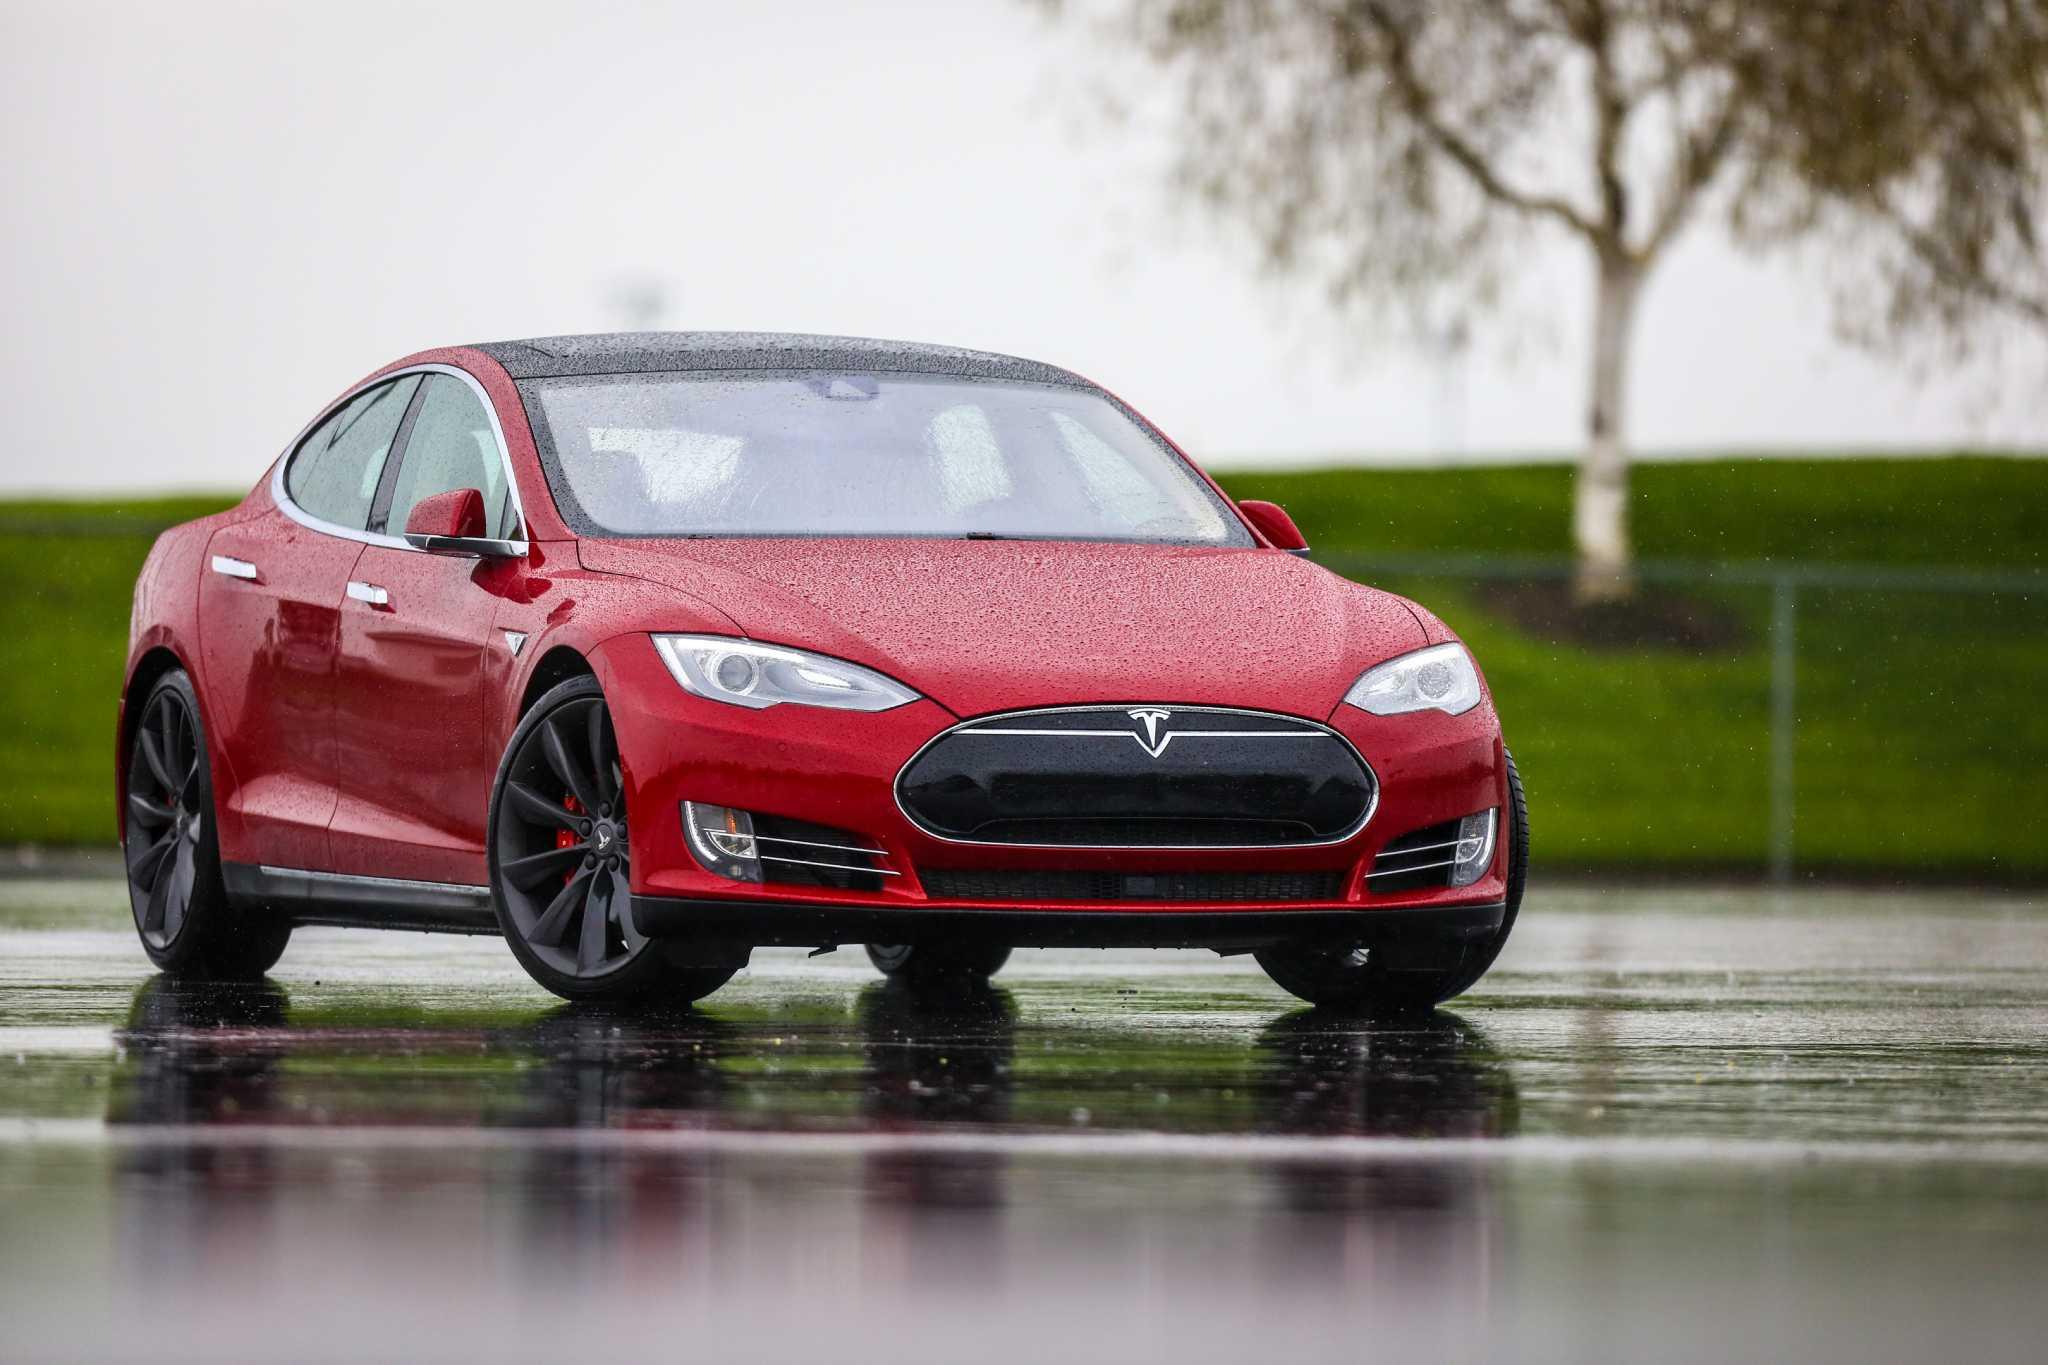 39 Insane 39 Dual Motor Tesla Model S On Closed Course